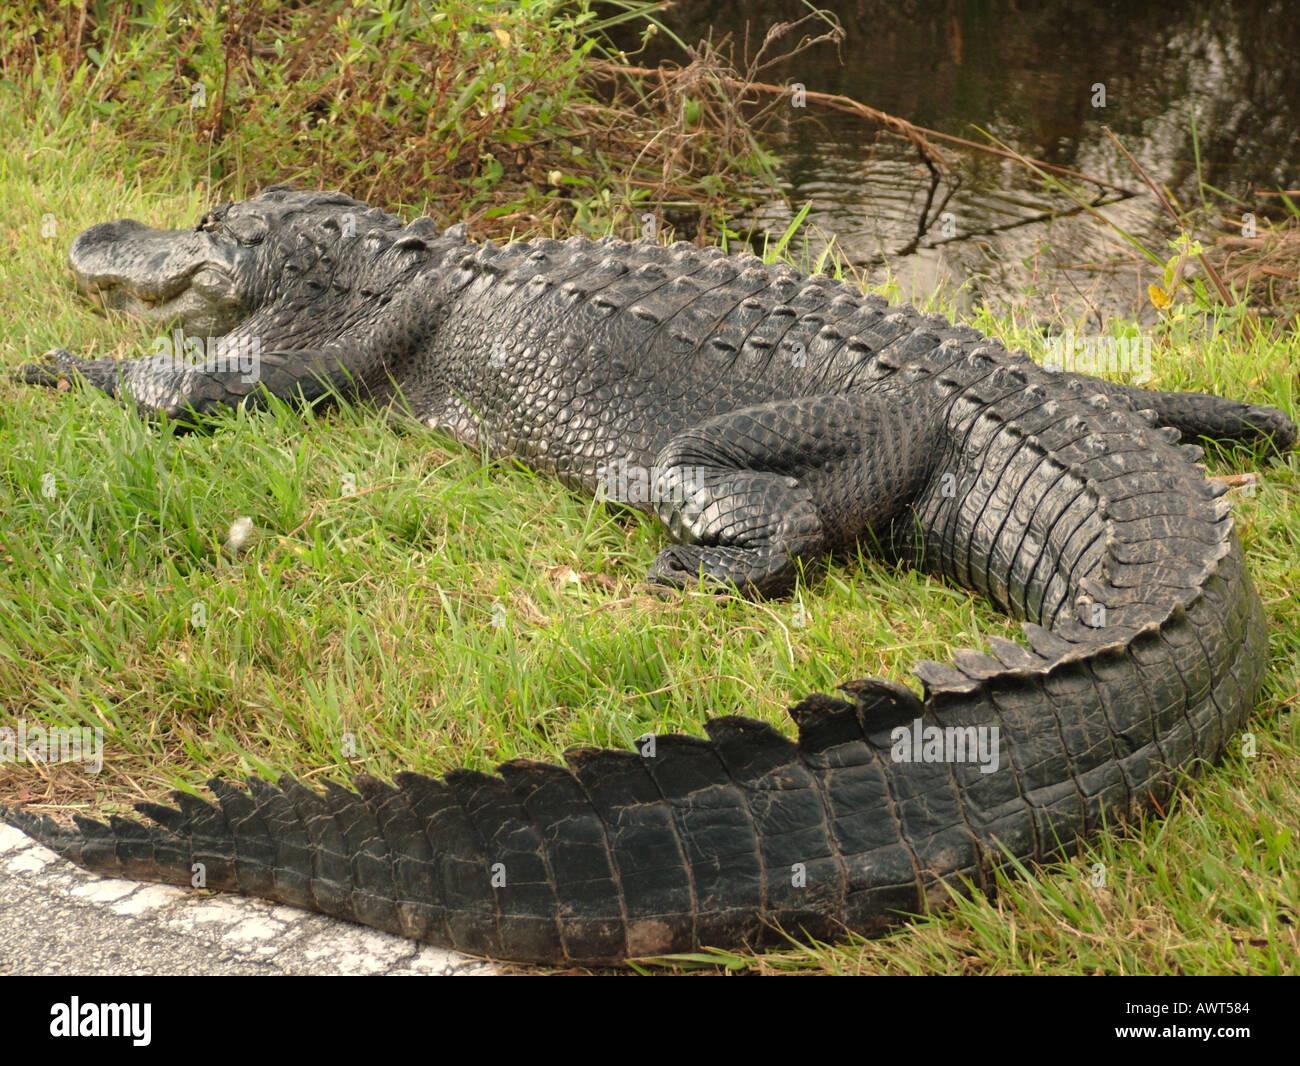 AJD39497, Everglades National Park, FL, Florida Foto Stock